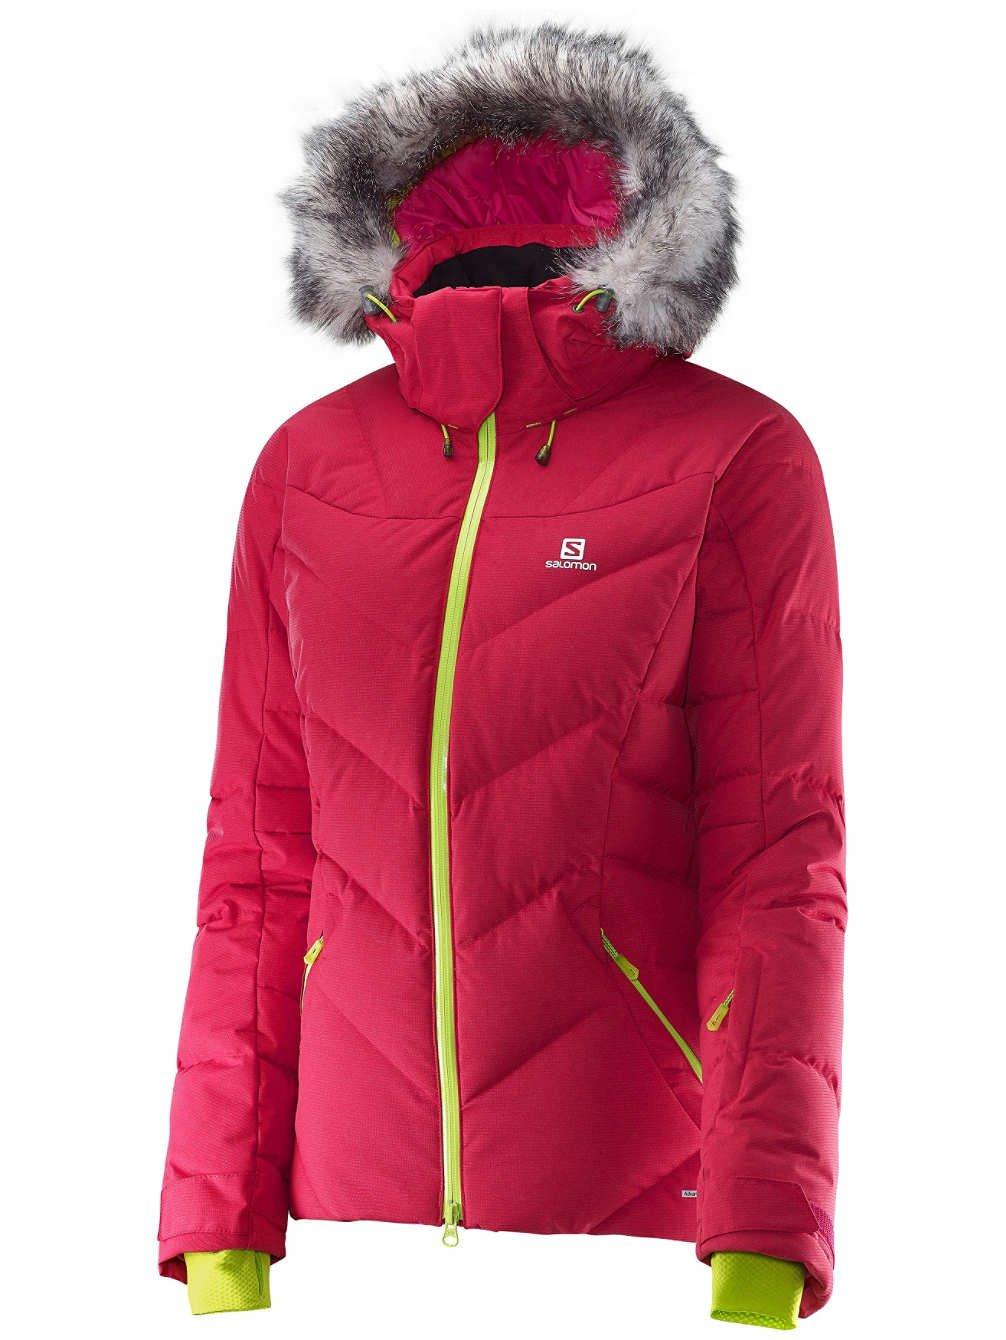 Damen Snowboard Jacke Salomon Icetown Jacket